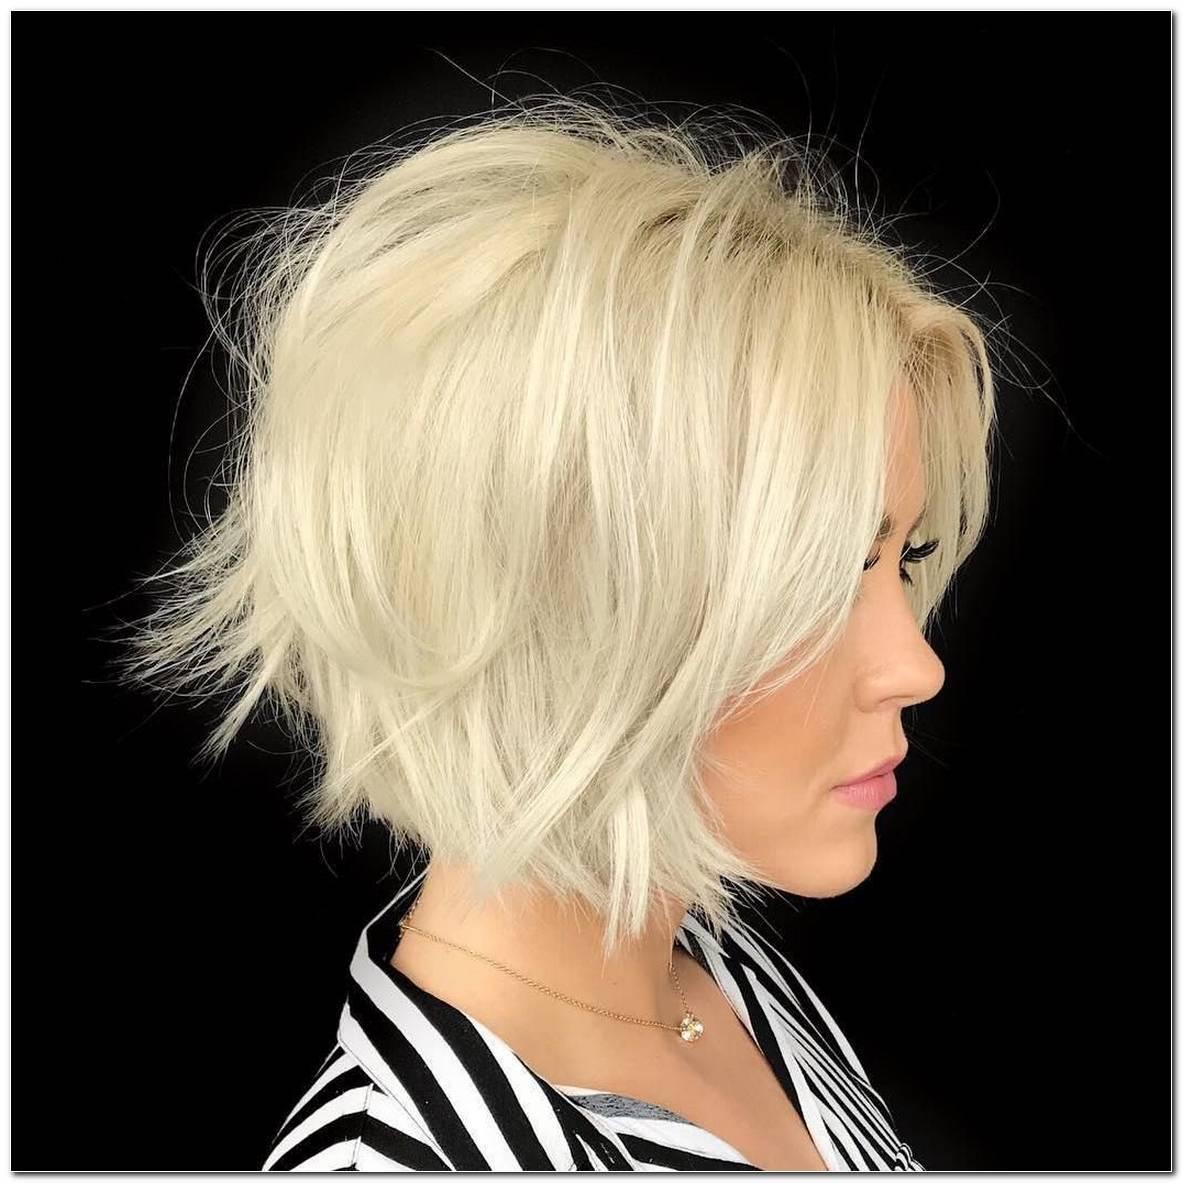 Frisuren FüR Kurzes Naturgewelltes Haar